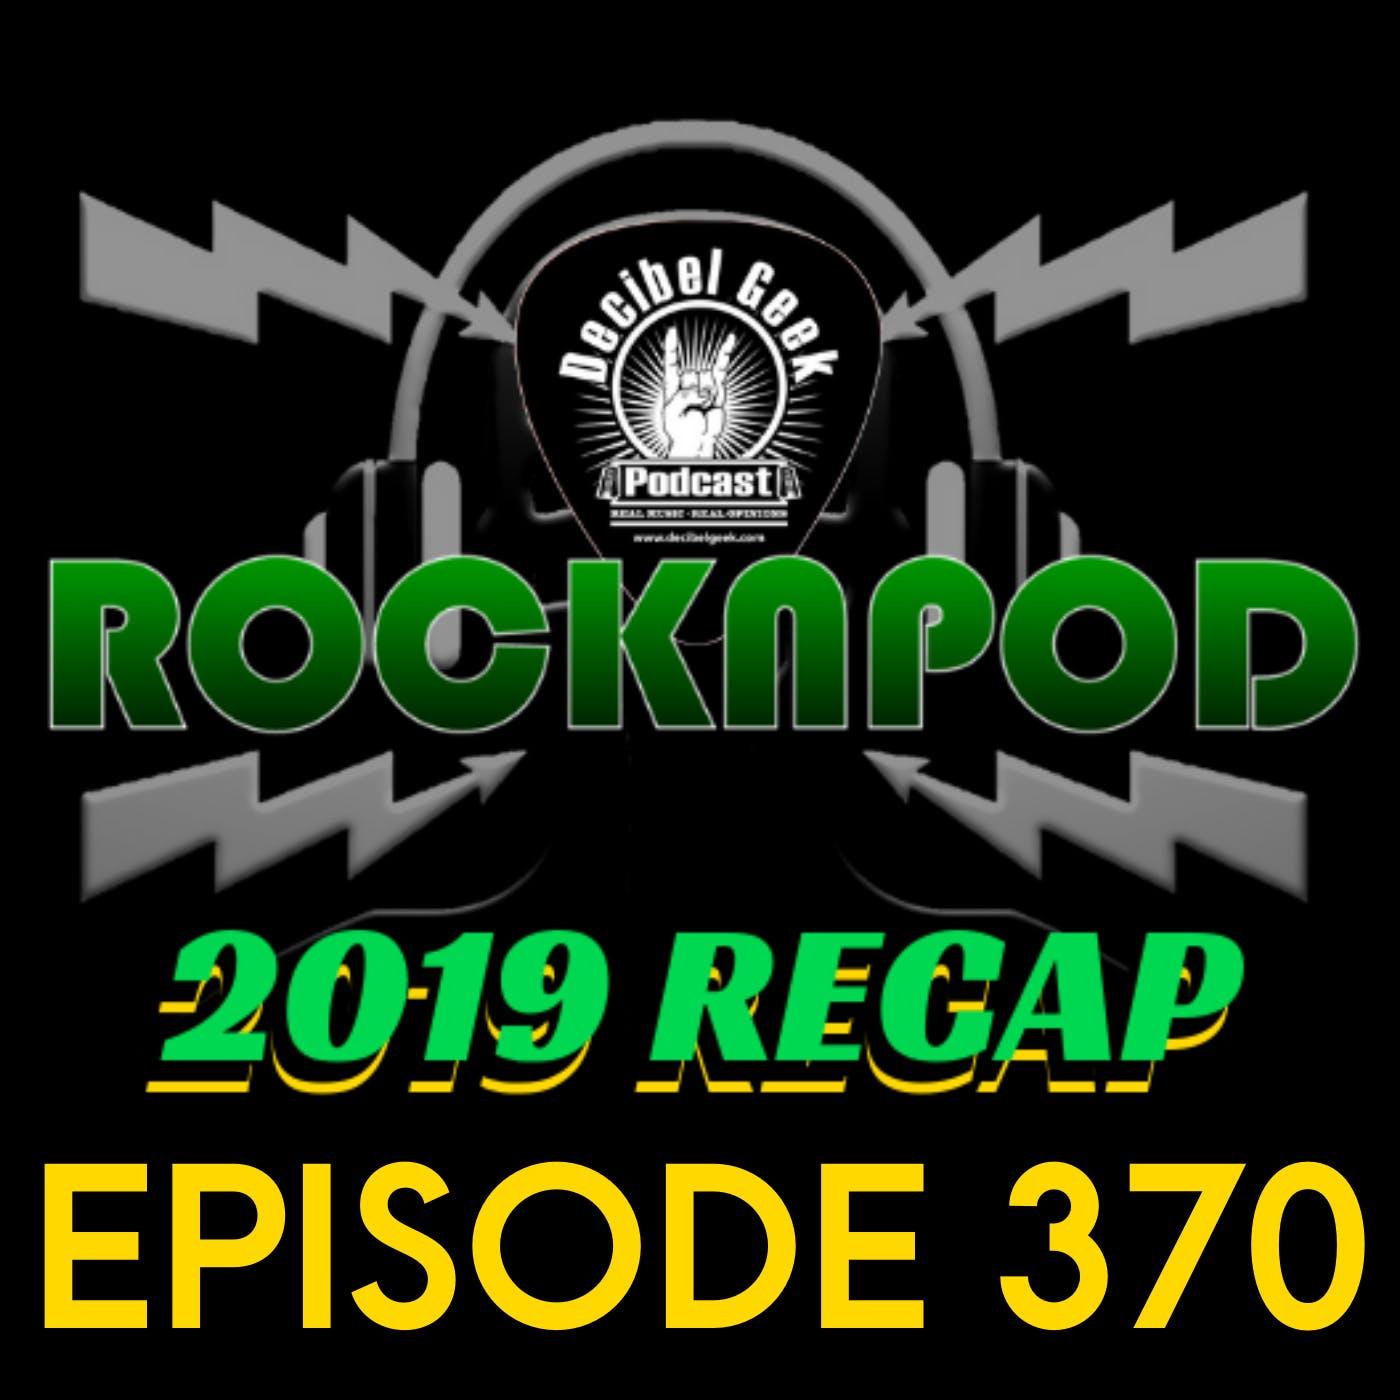 ROCKNPOD 2019 Recap - Ep370